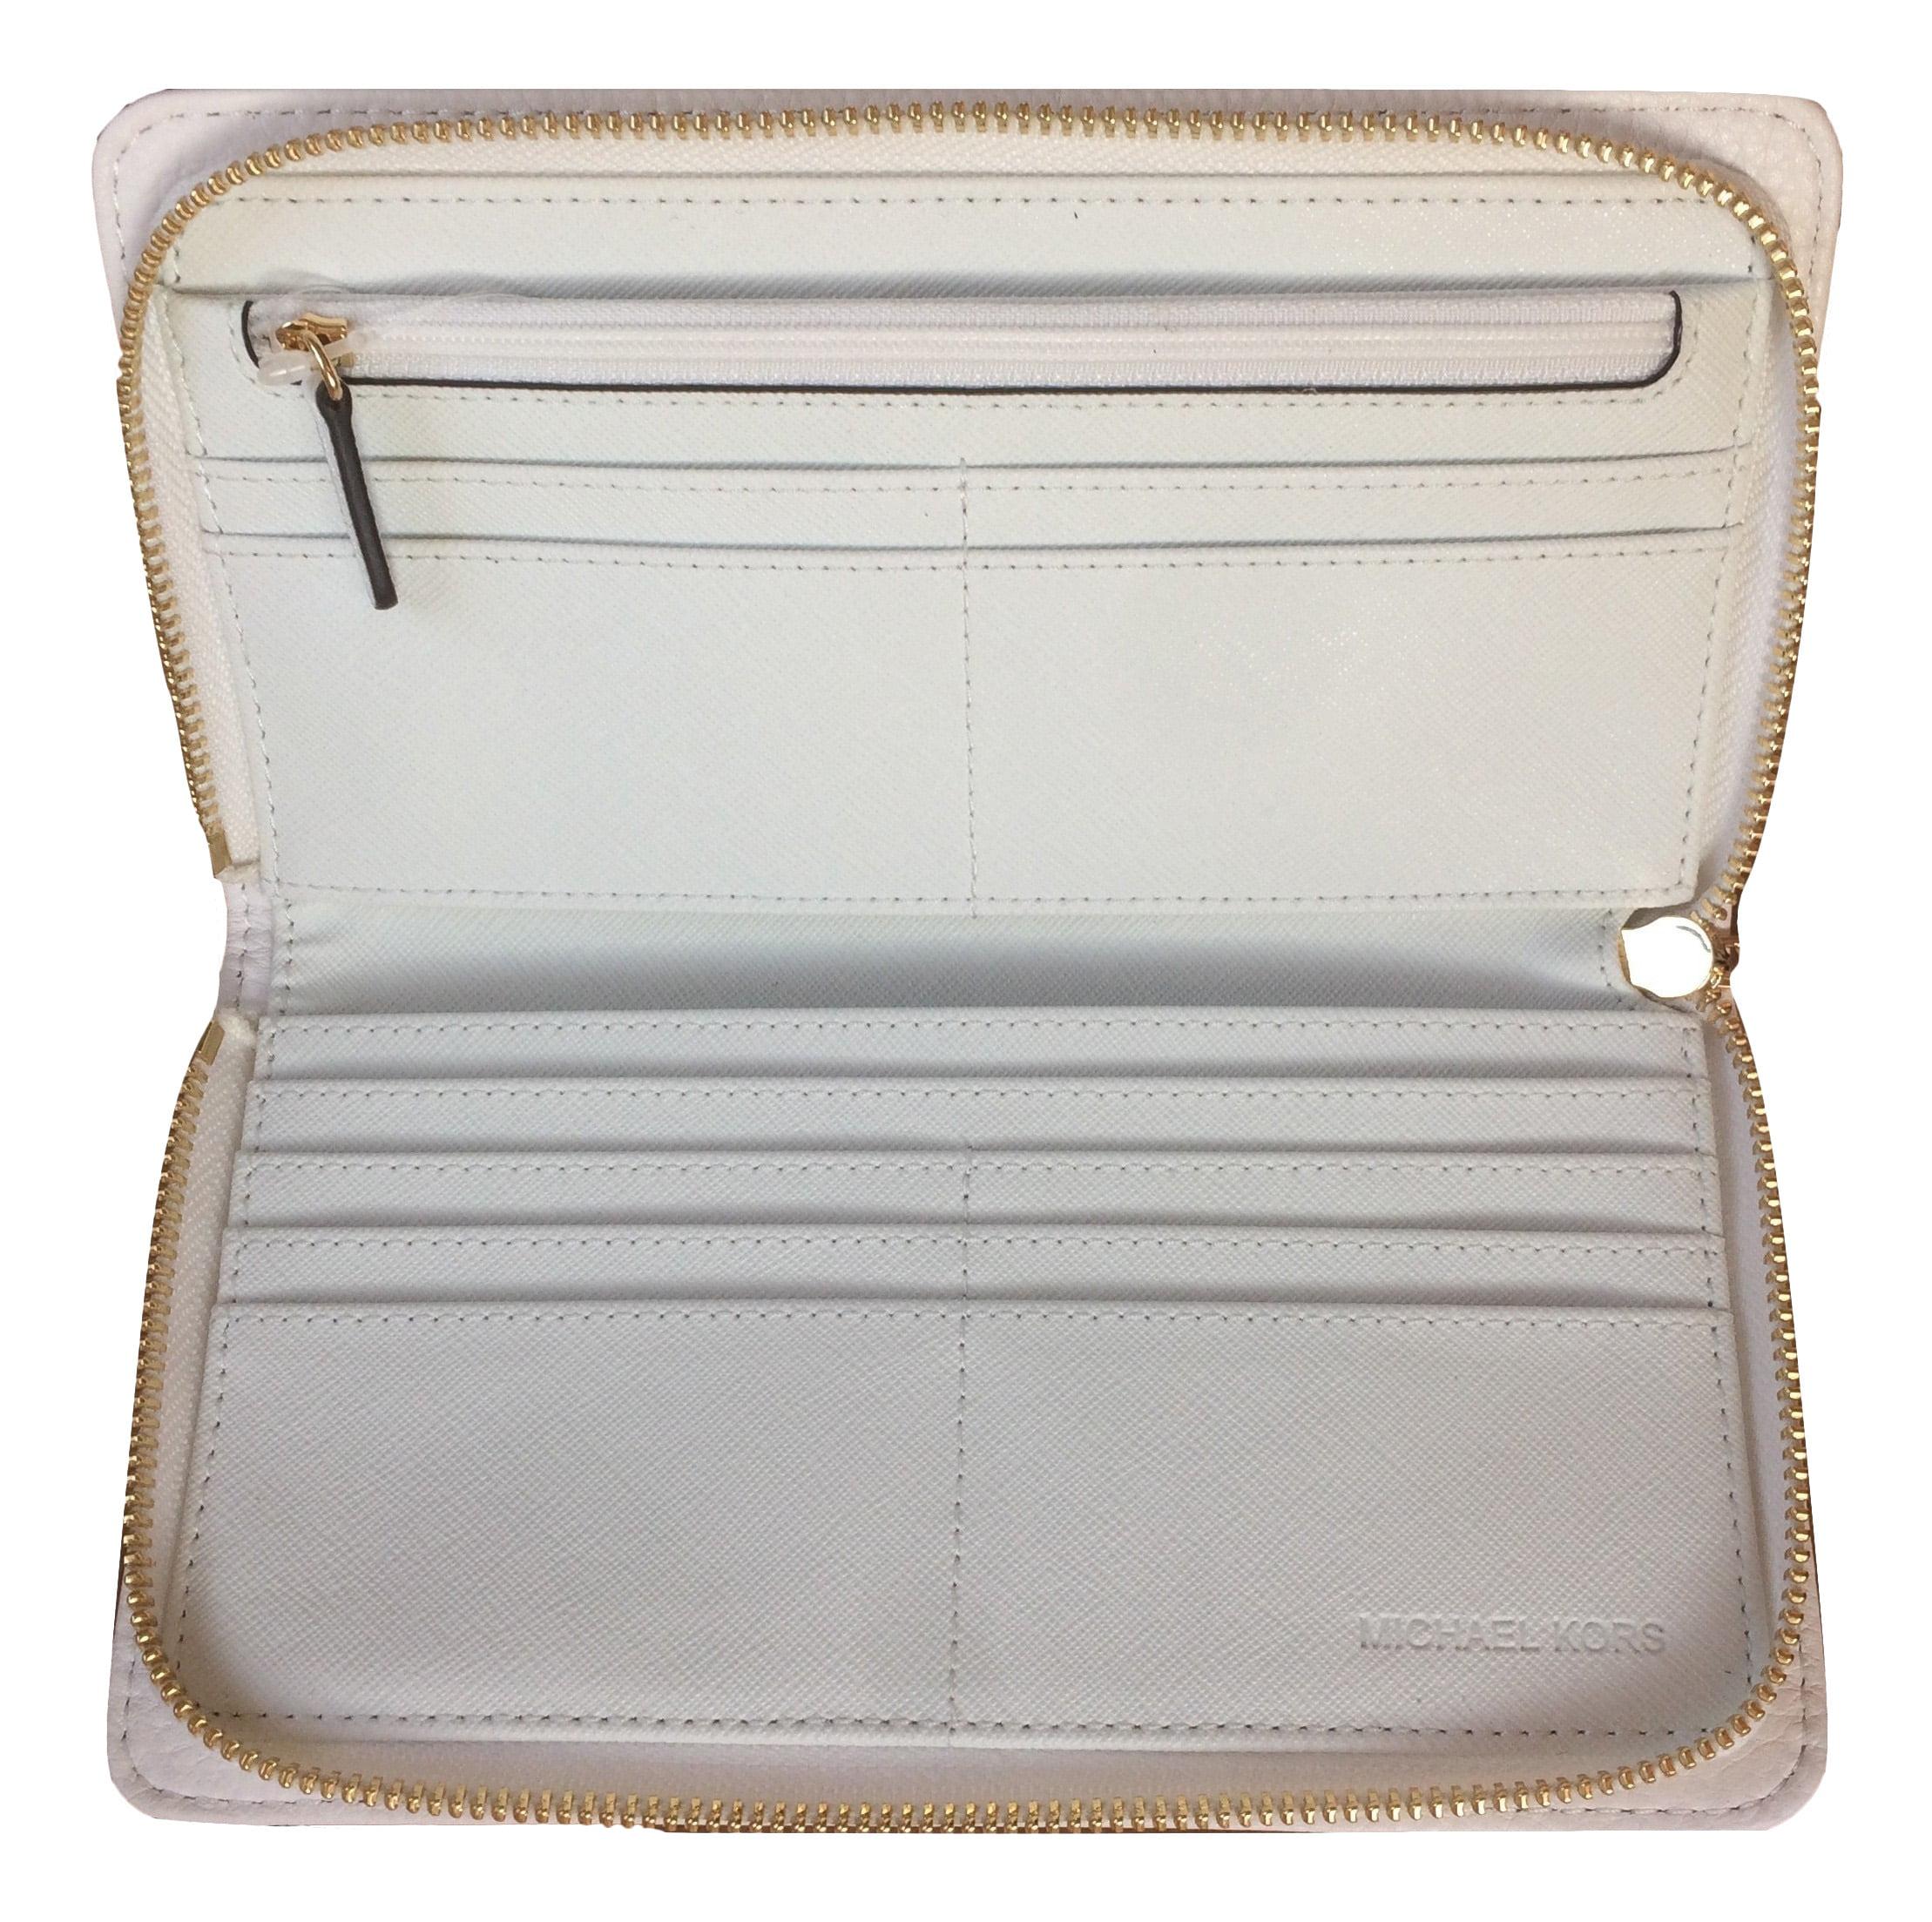 d767148088cb7 Michael Kors - Michael Kors Hamilton Traveler Large Zip Around Leather  Wallet - Walmart.com